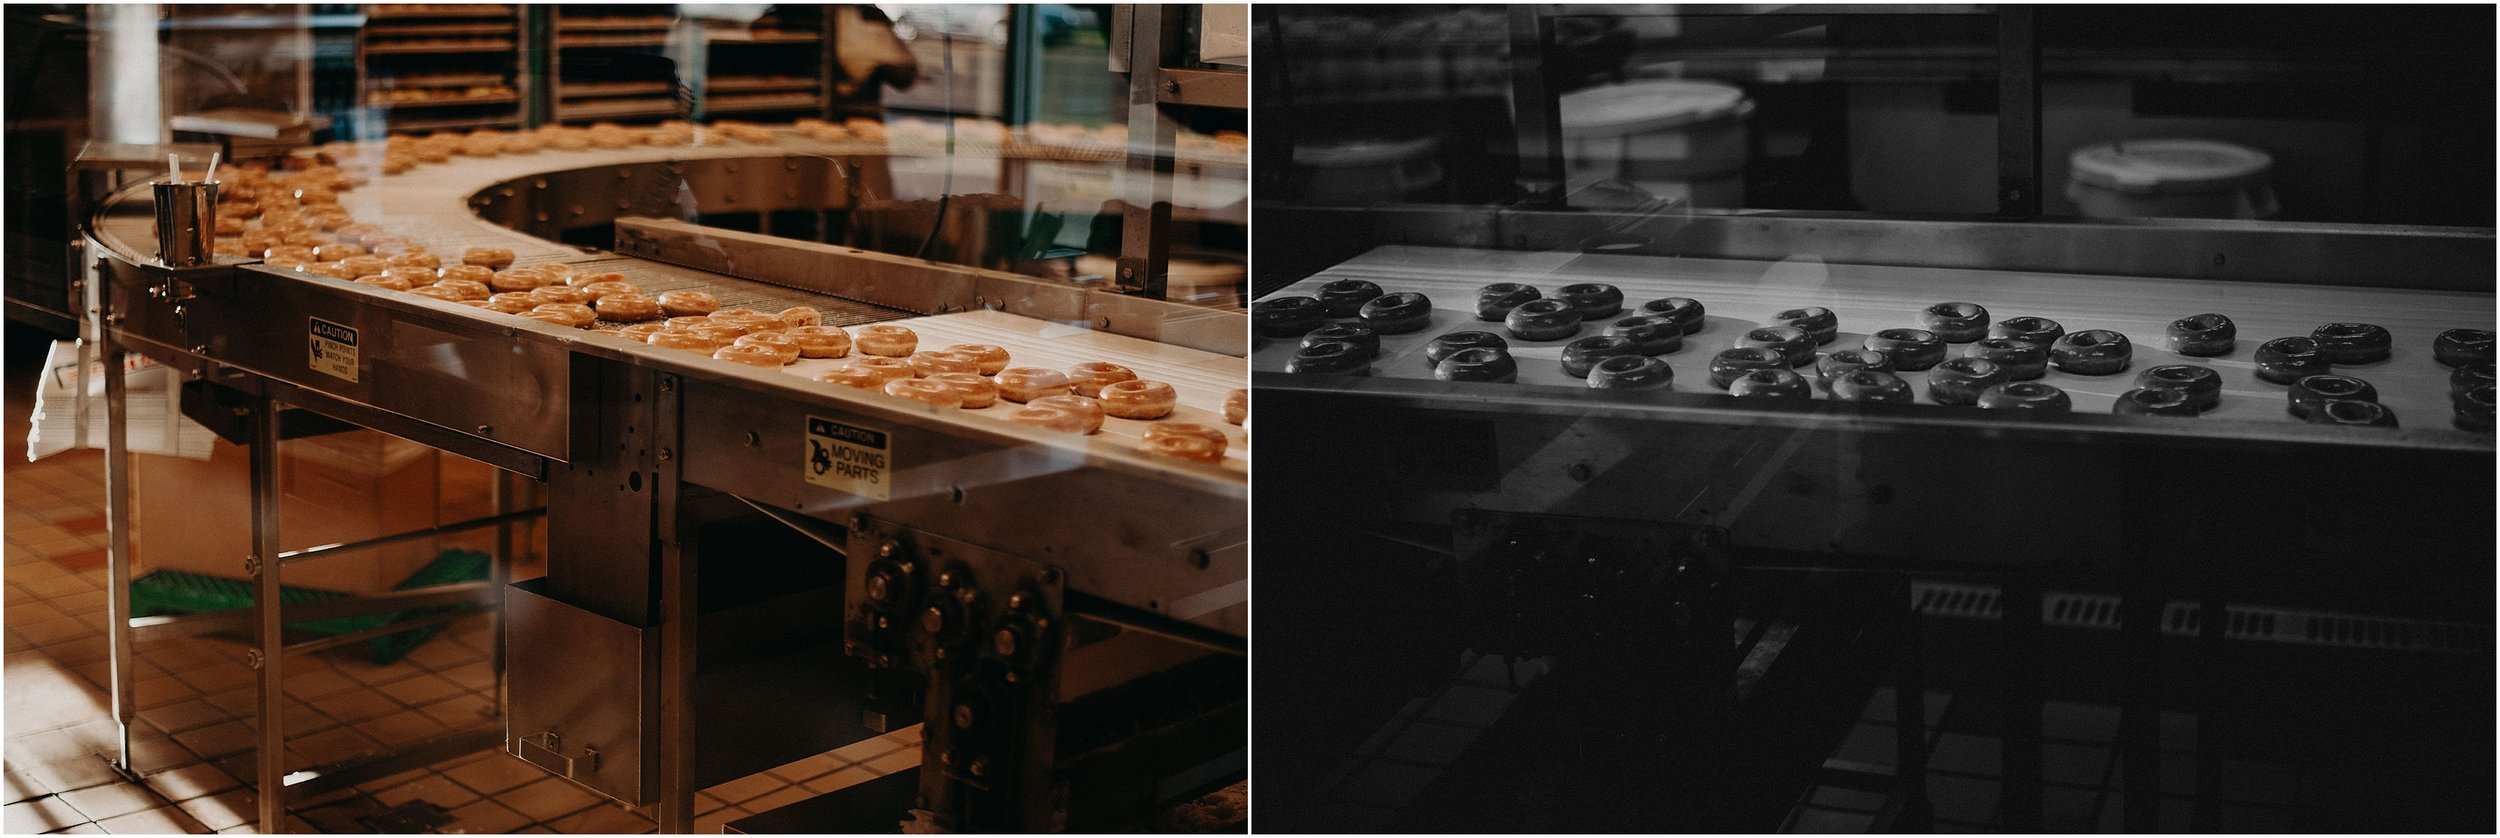 Hot and fresh glazed doughnuts at Krispy Kreme